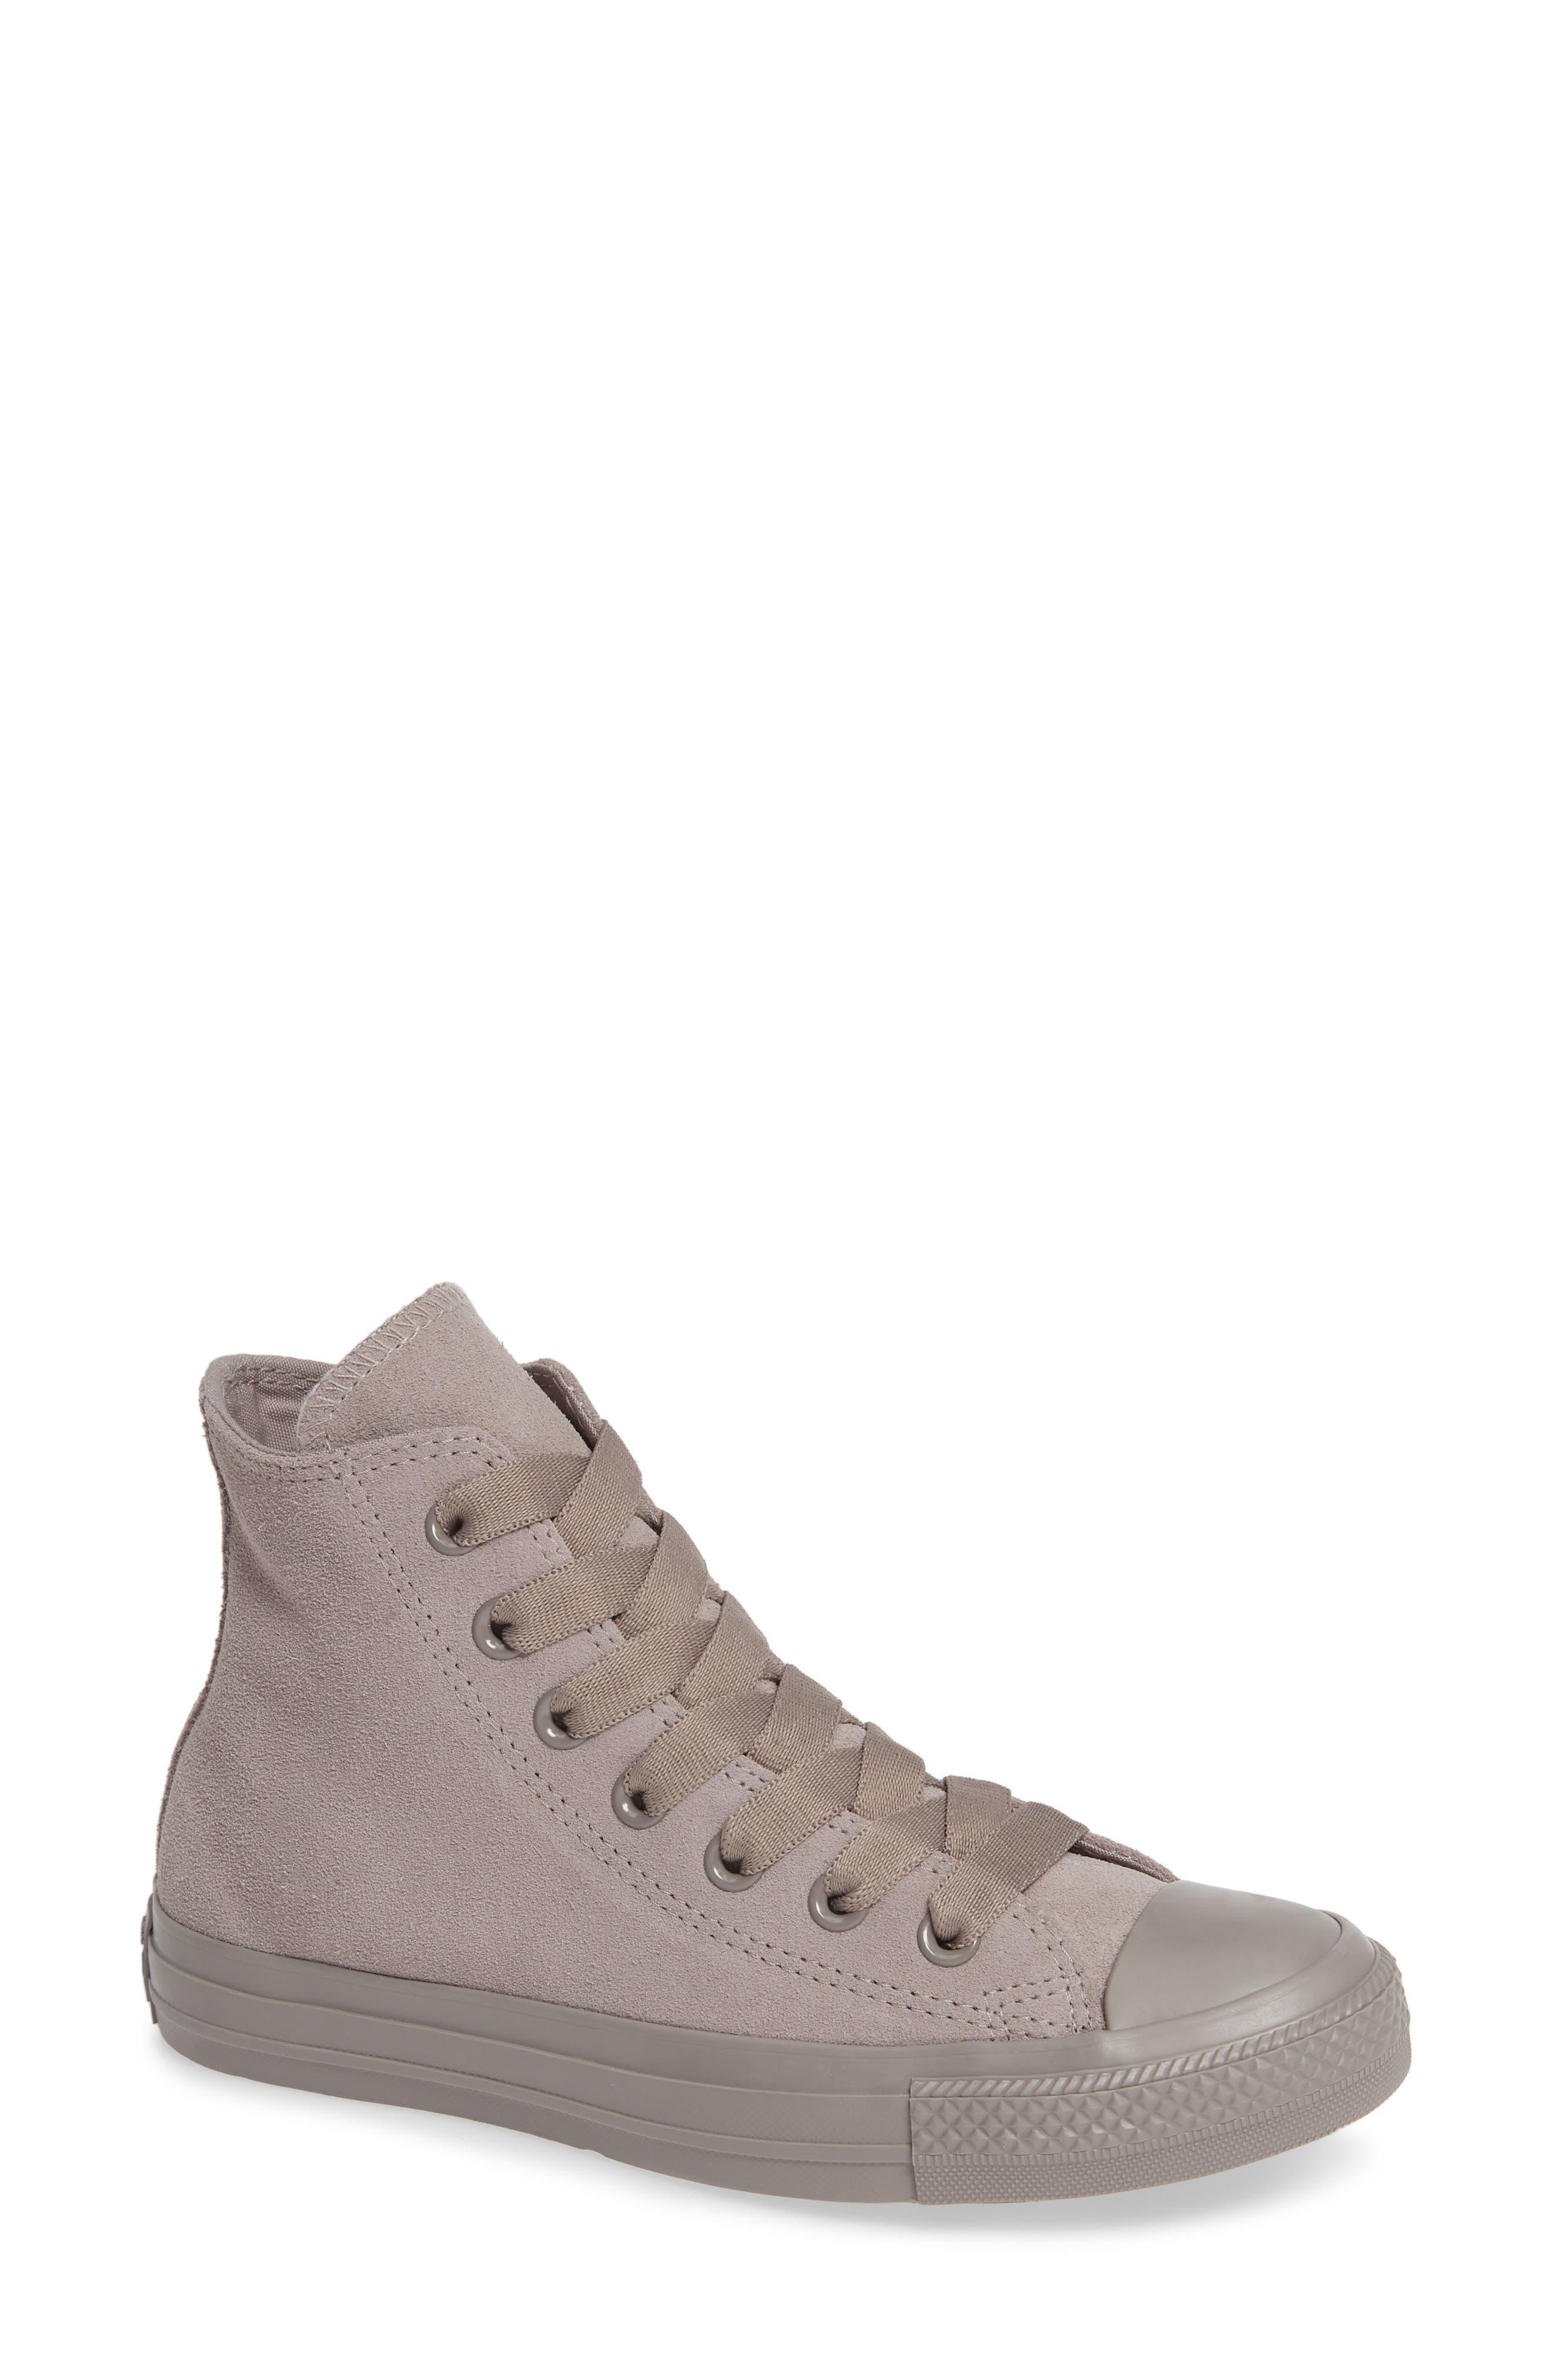 Chuck Taylor<sup>®</sup> All Star<sup>®</sup> Hi Sneaker,                             Main thumbnail 1, color,                             MERCURY GREY SUEDE